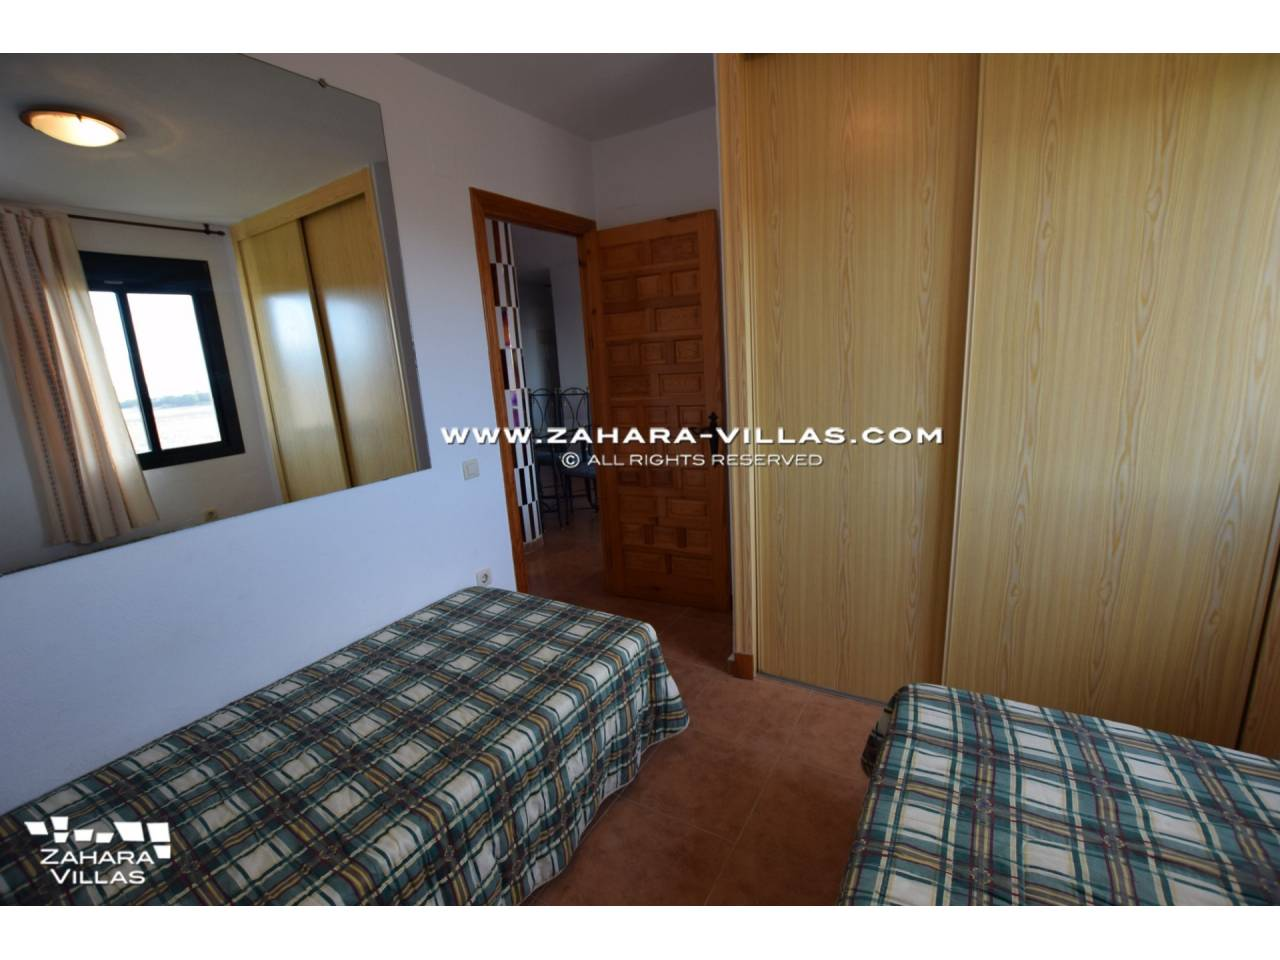 Imagen 23 de Penthouse for sale in Zahara de los Atunes